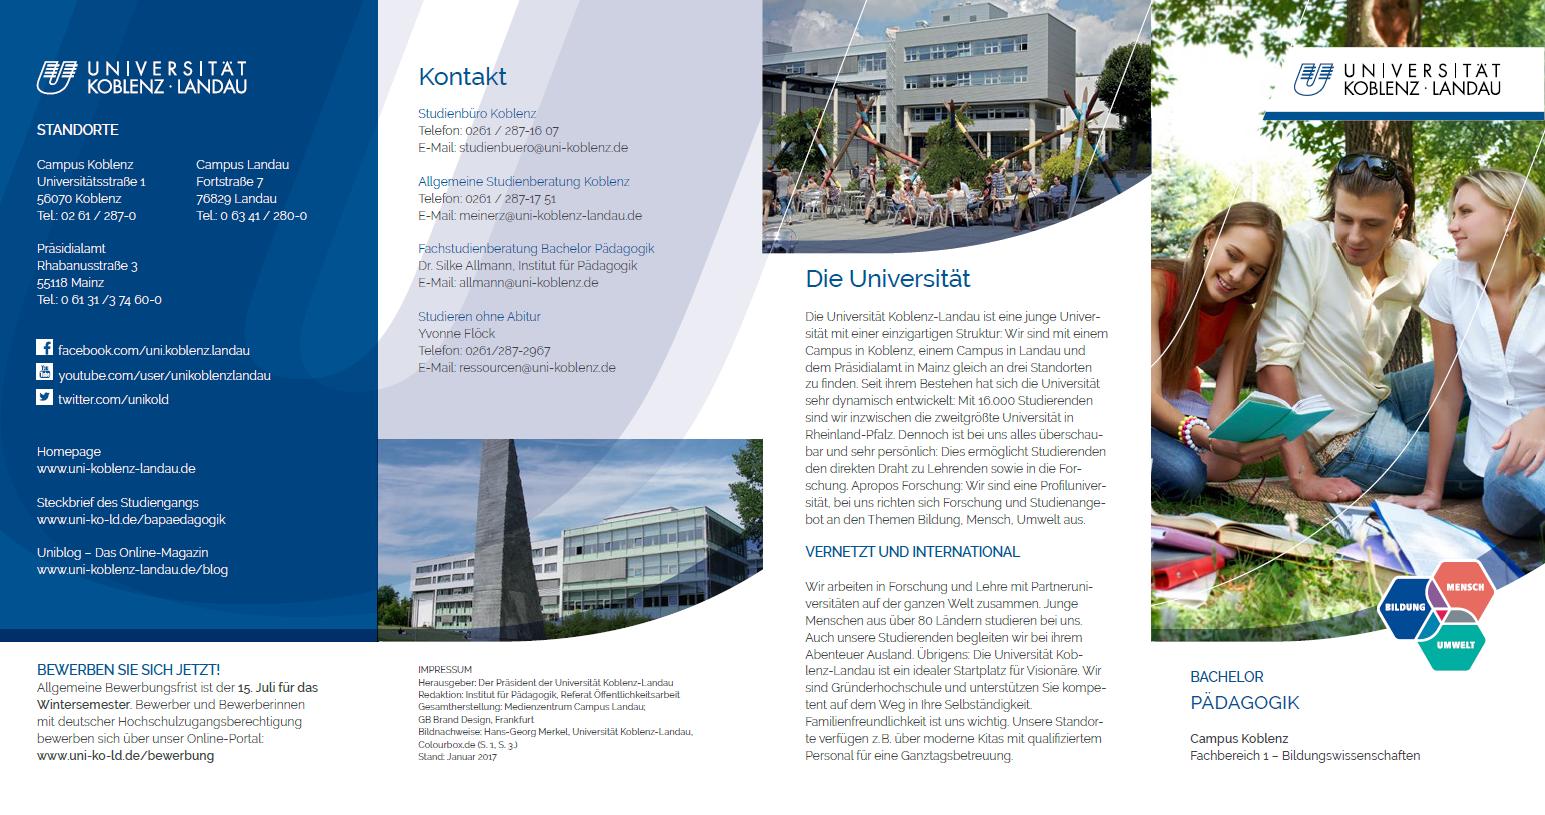 Studiengangsflyer B.A. Pädagogik